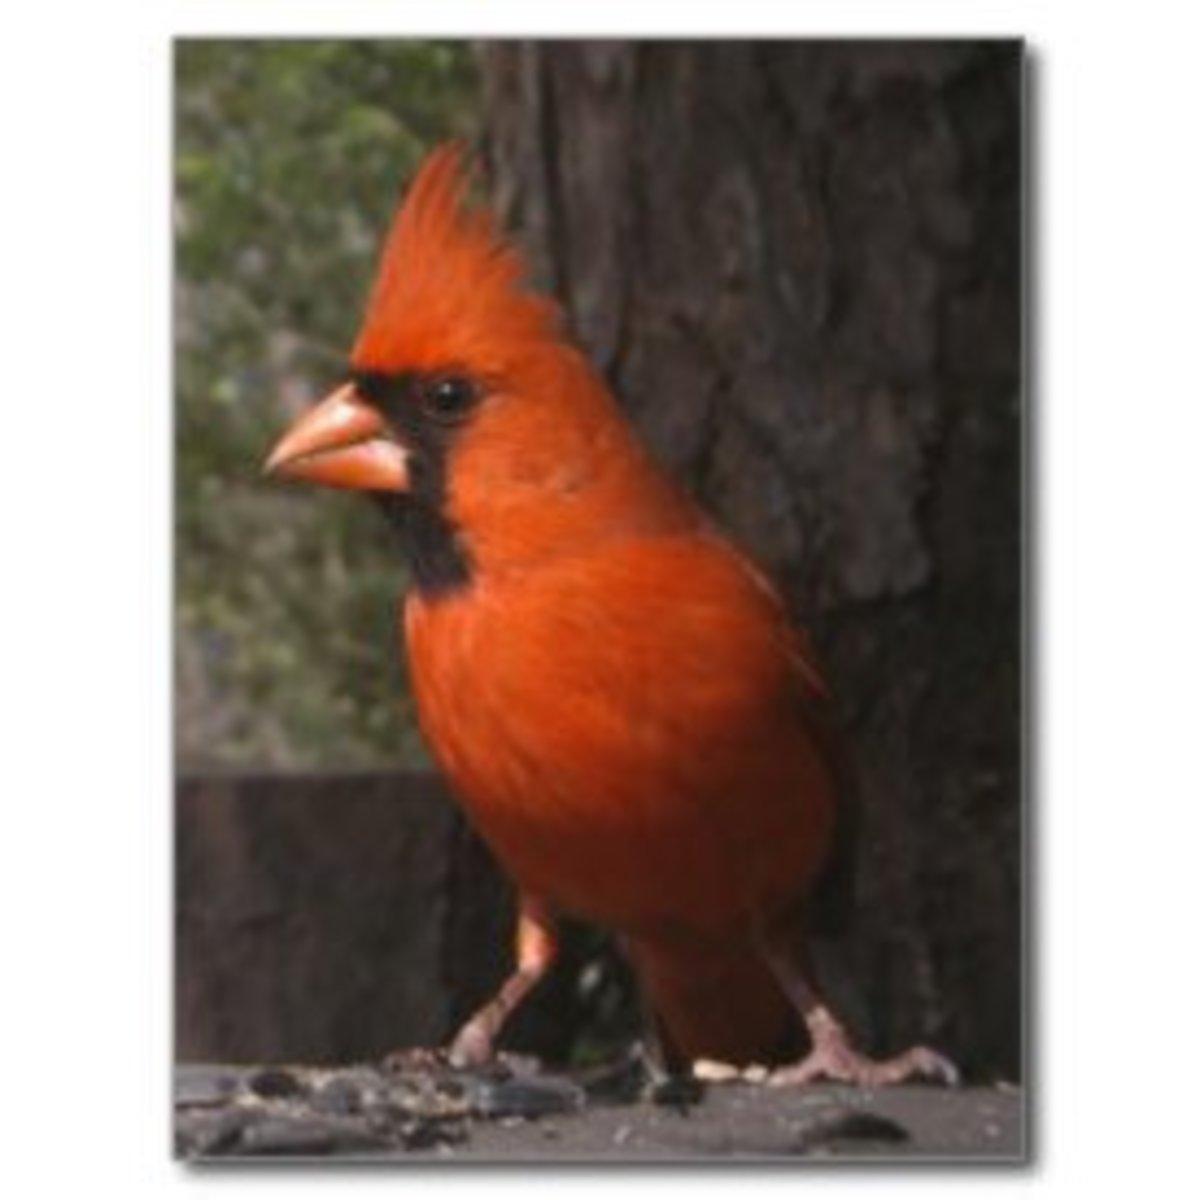 How long do cardinals live?